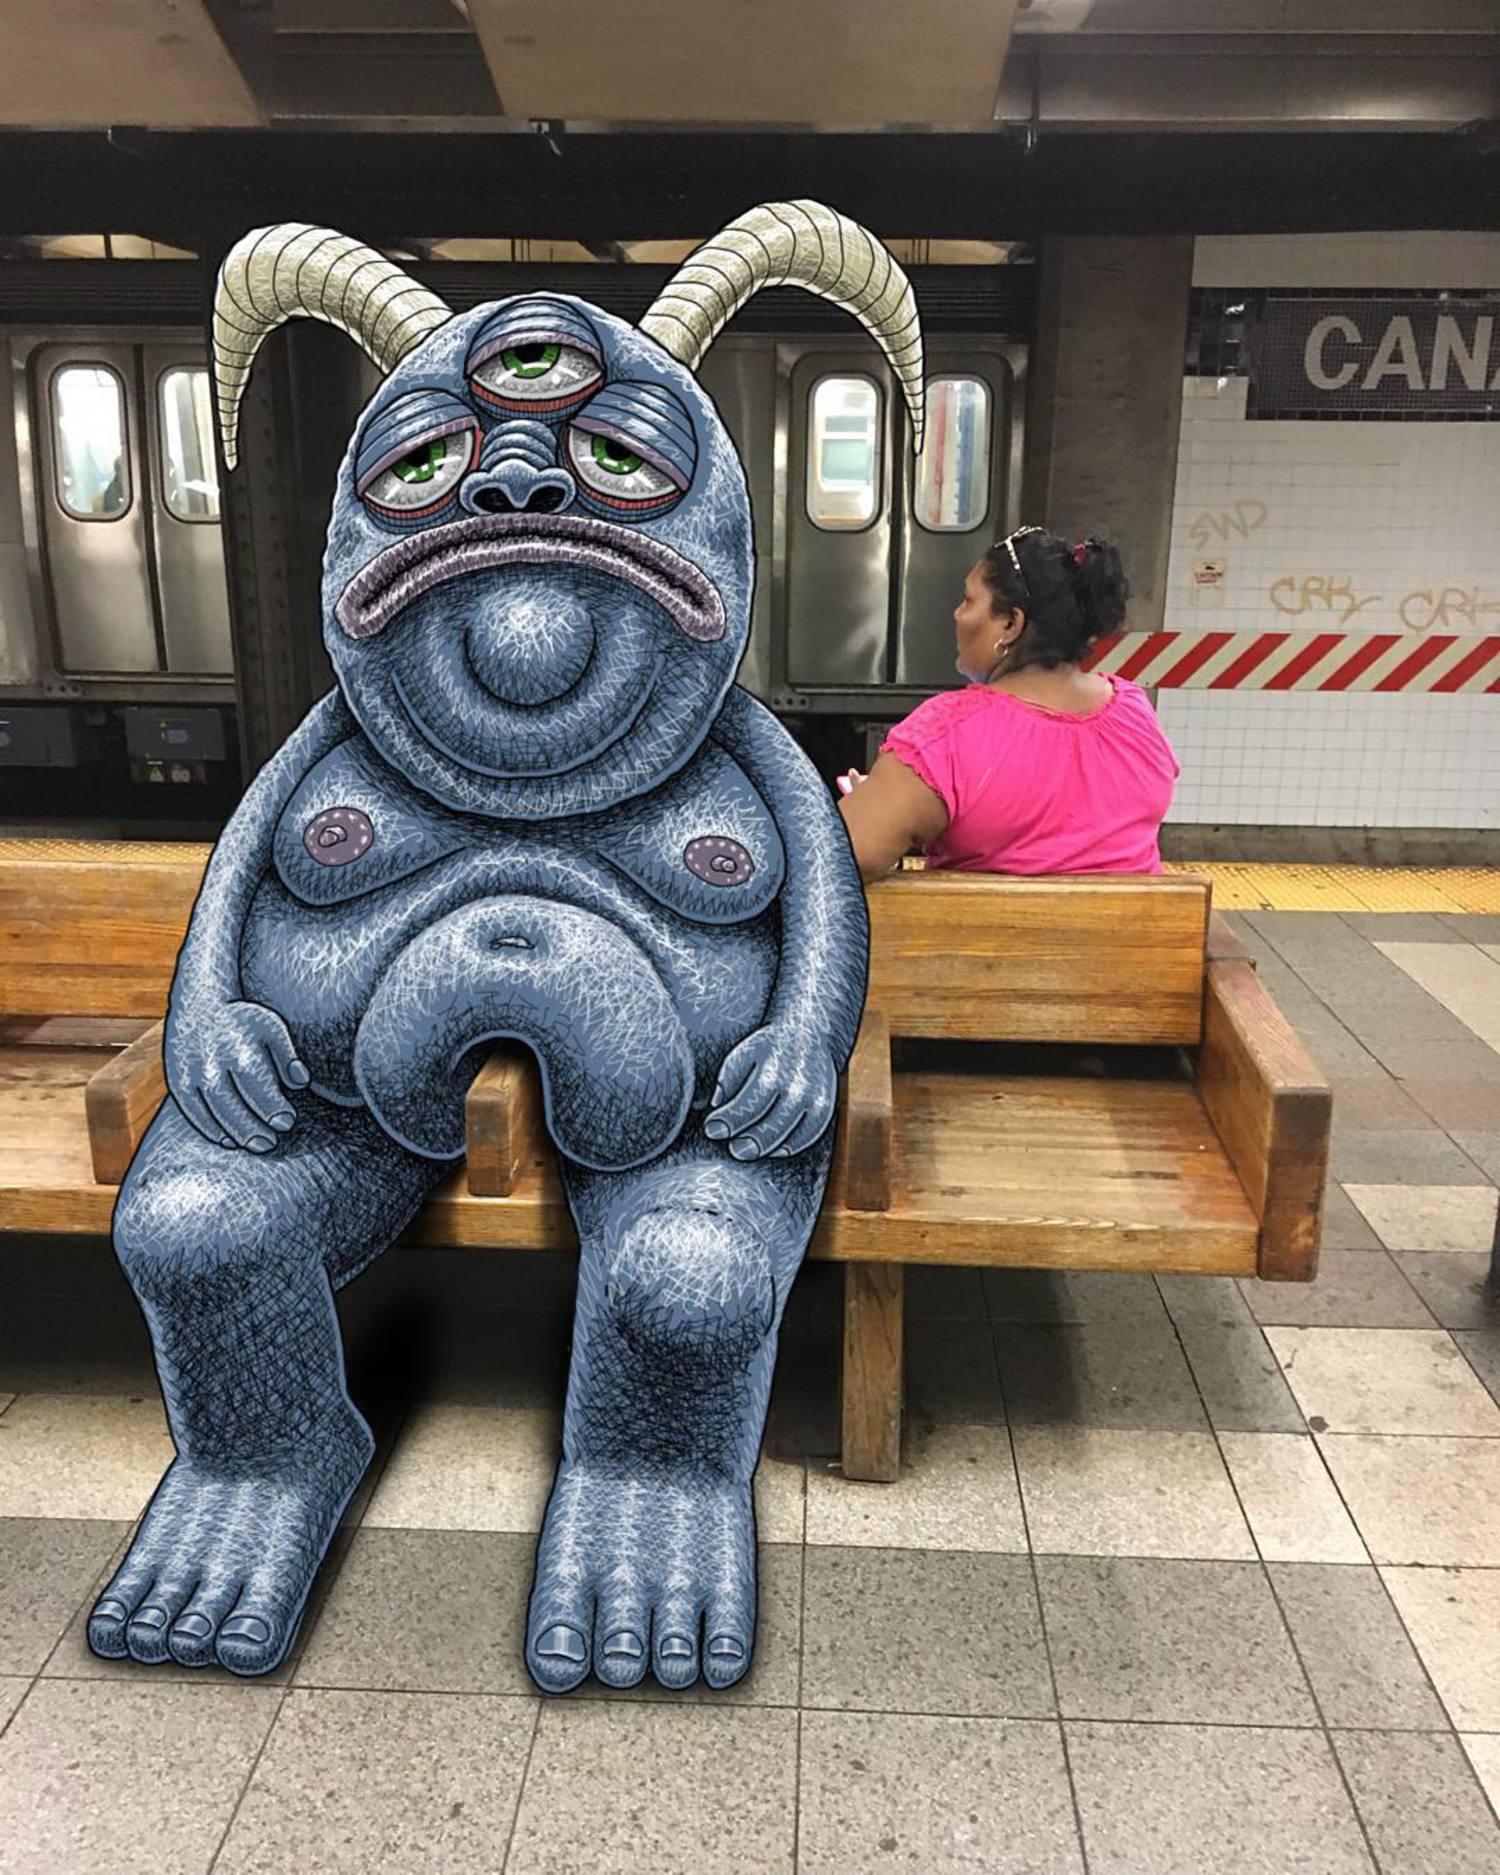 #subwaydoodle #subway #doodle #swd #nyc #canalstreet #twoseats